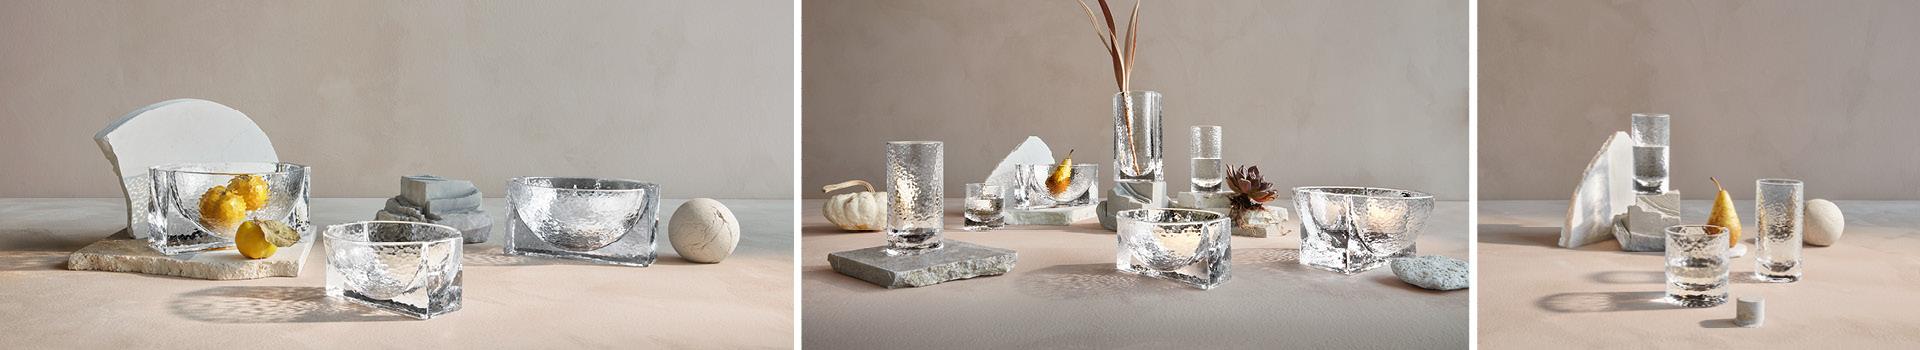 Holmegaard-Forma-drinkglass-skåler-d.jpg